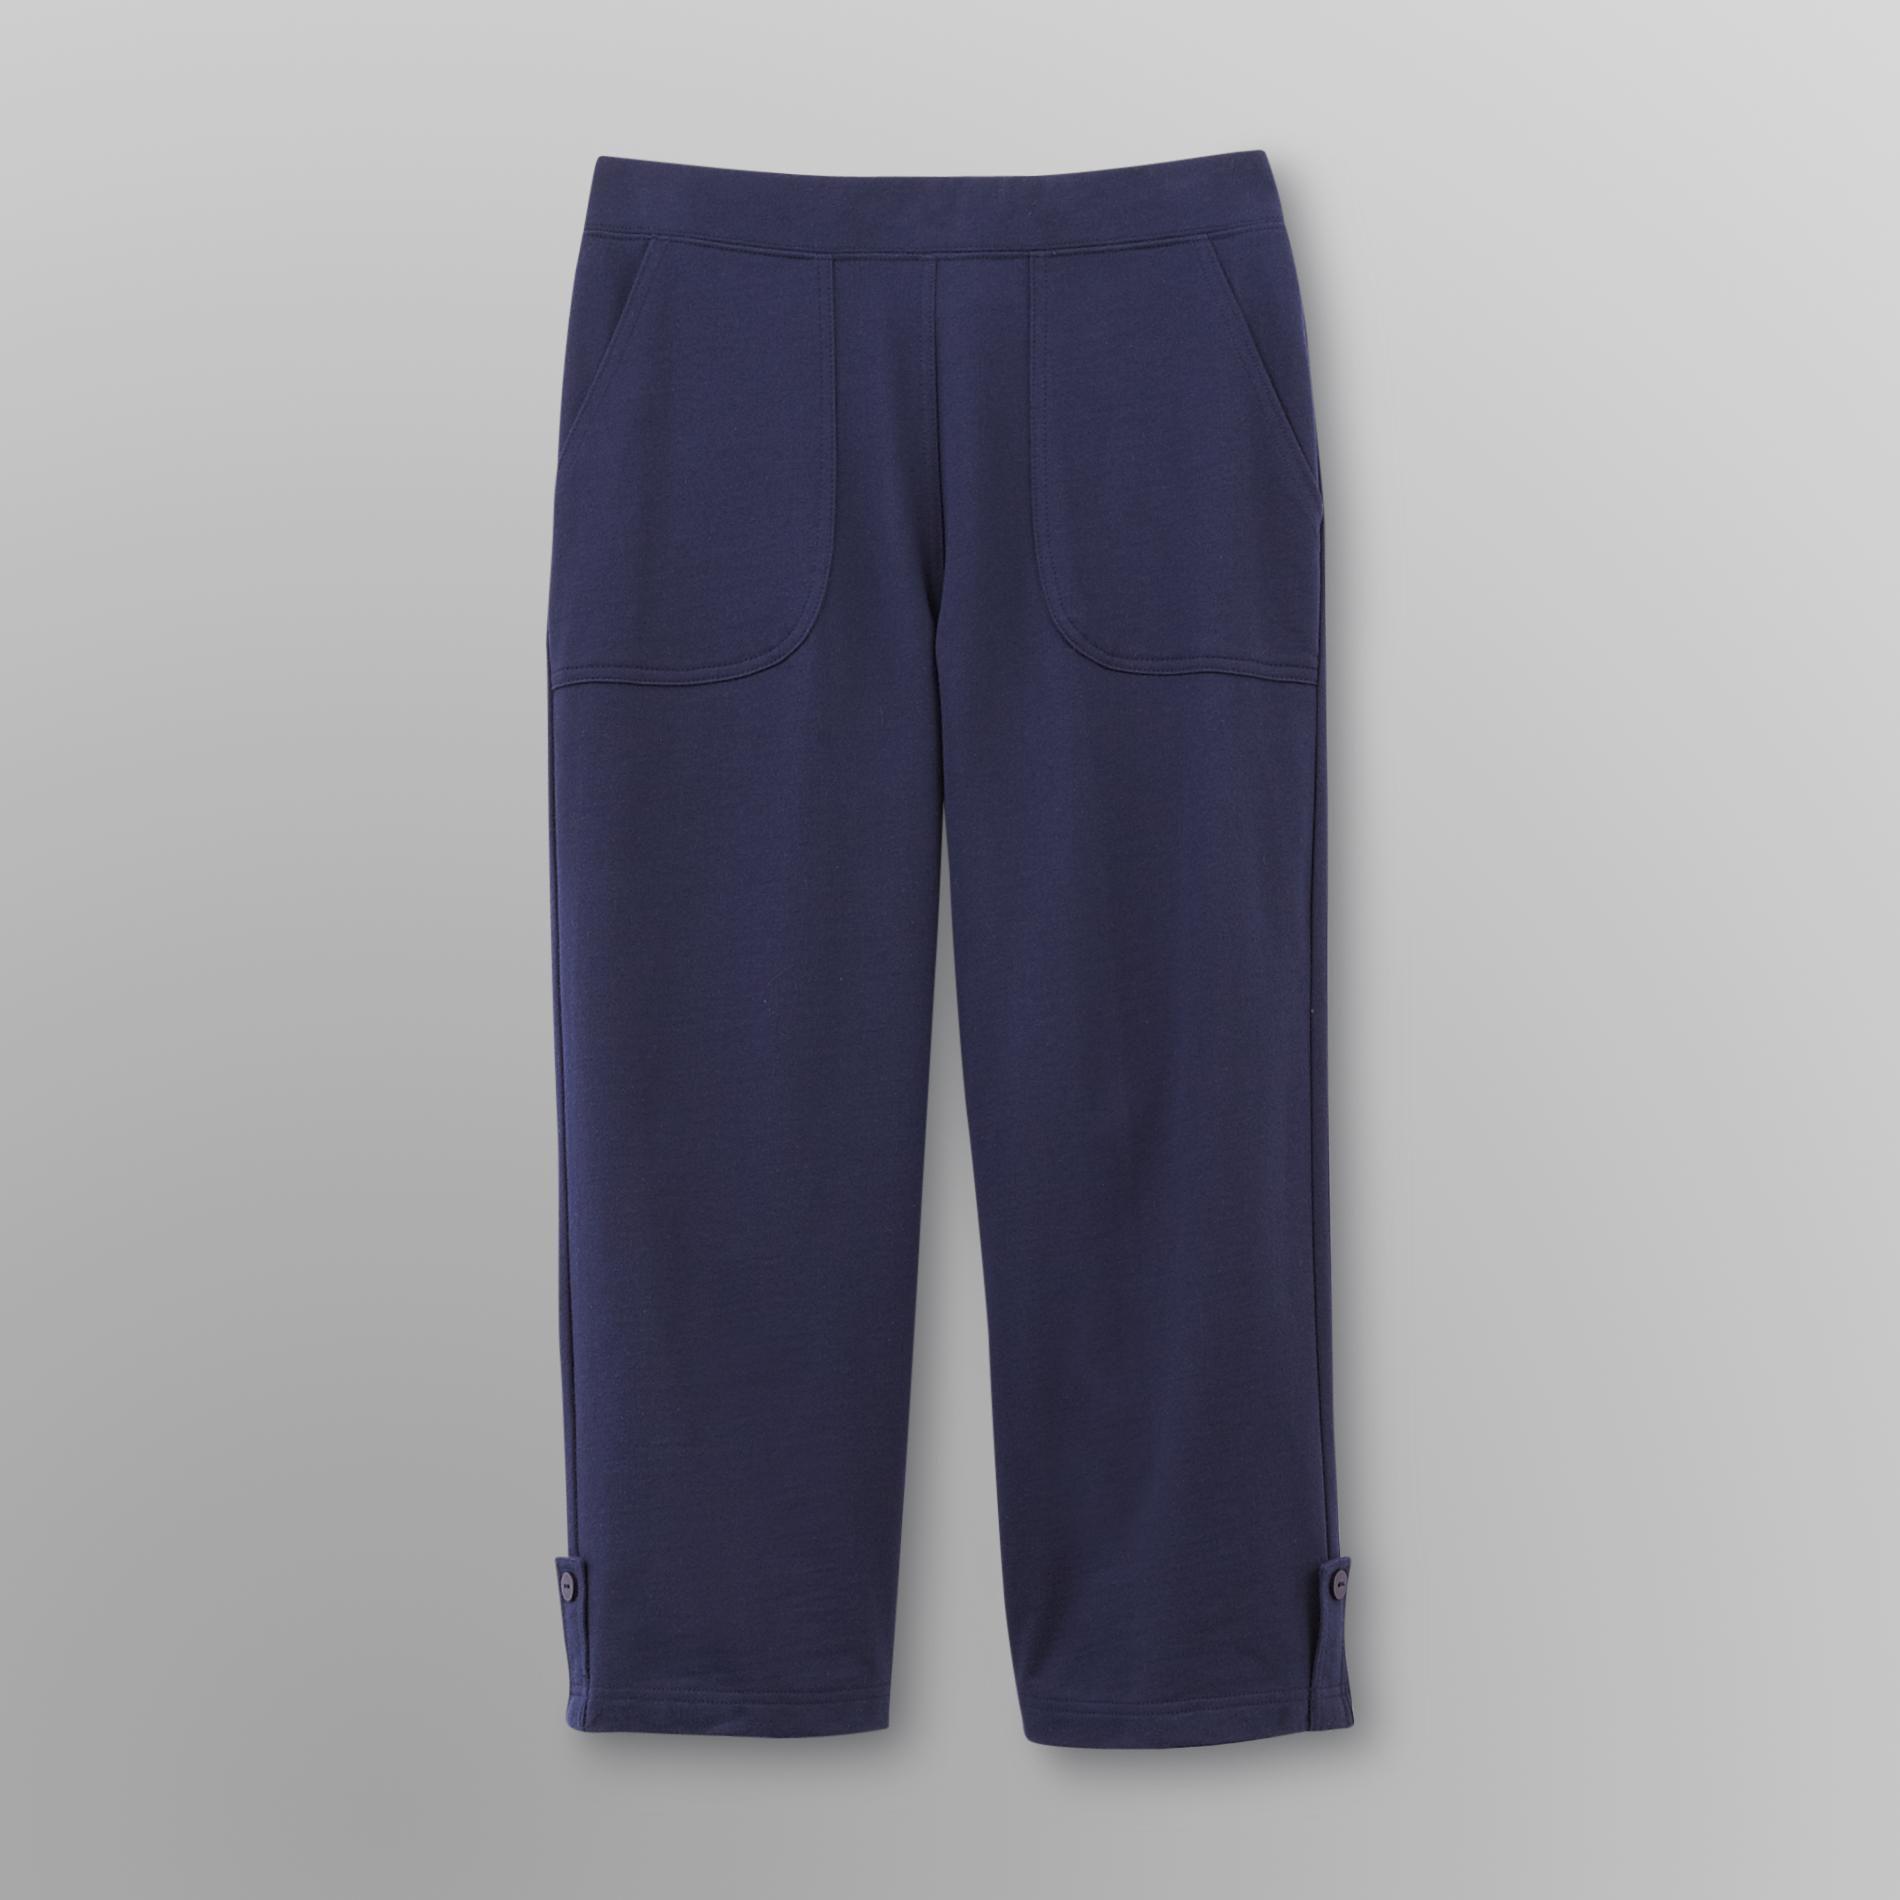 Basic Editions Women's Jersey Knit Capri Pants